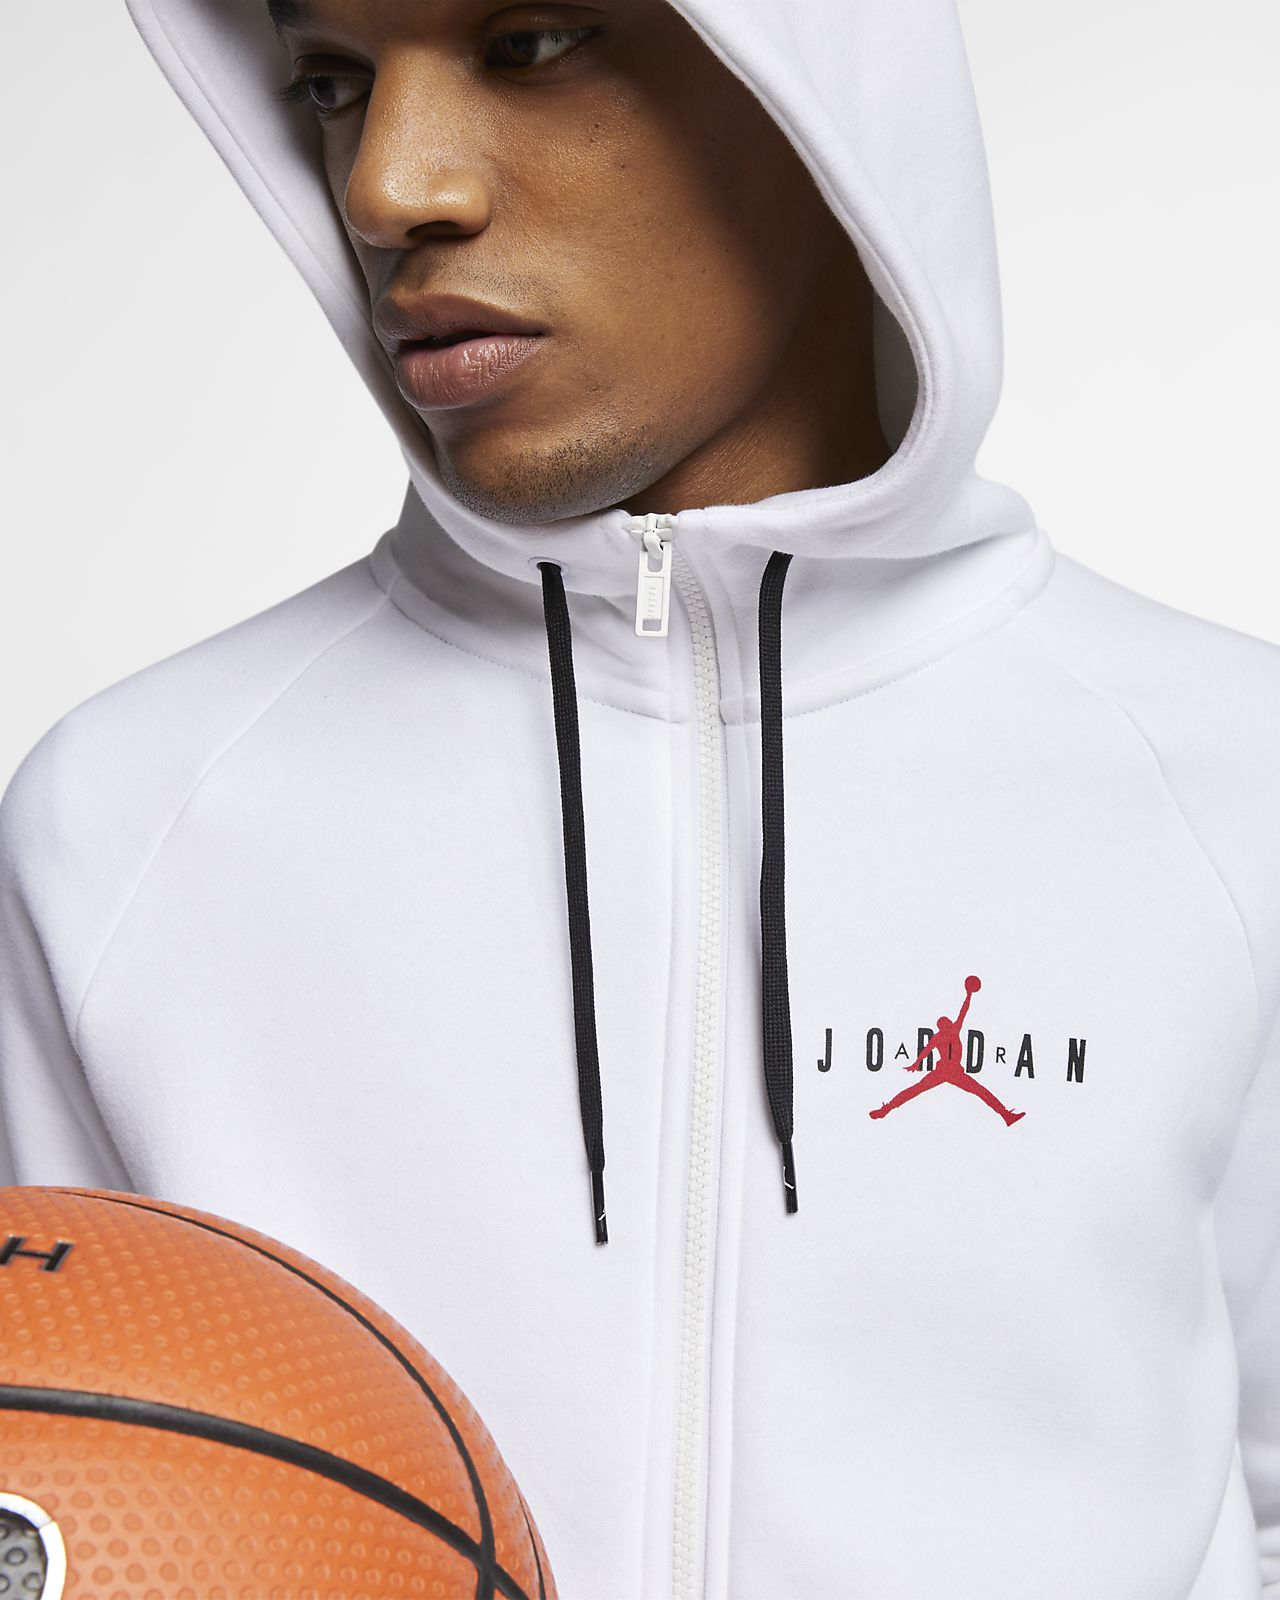 competitive price aa04b 1c7f0 ... Jordan Sportswear Jumpman Air Men s Full-Zip Hoodie